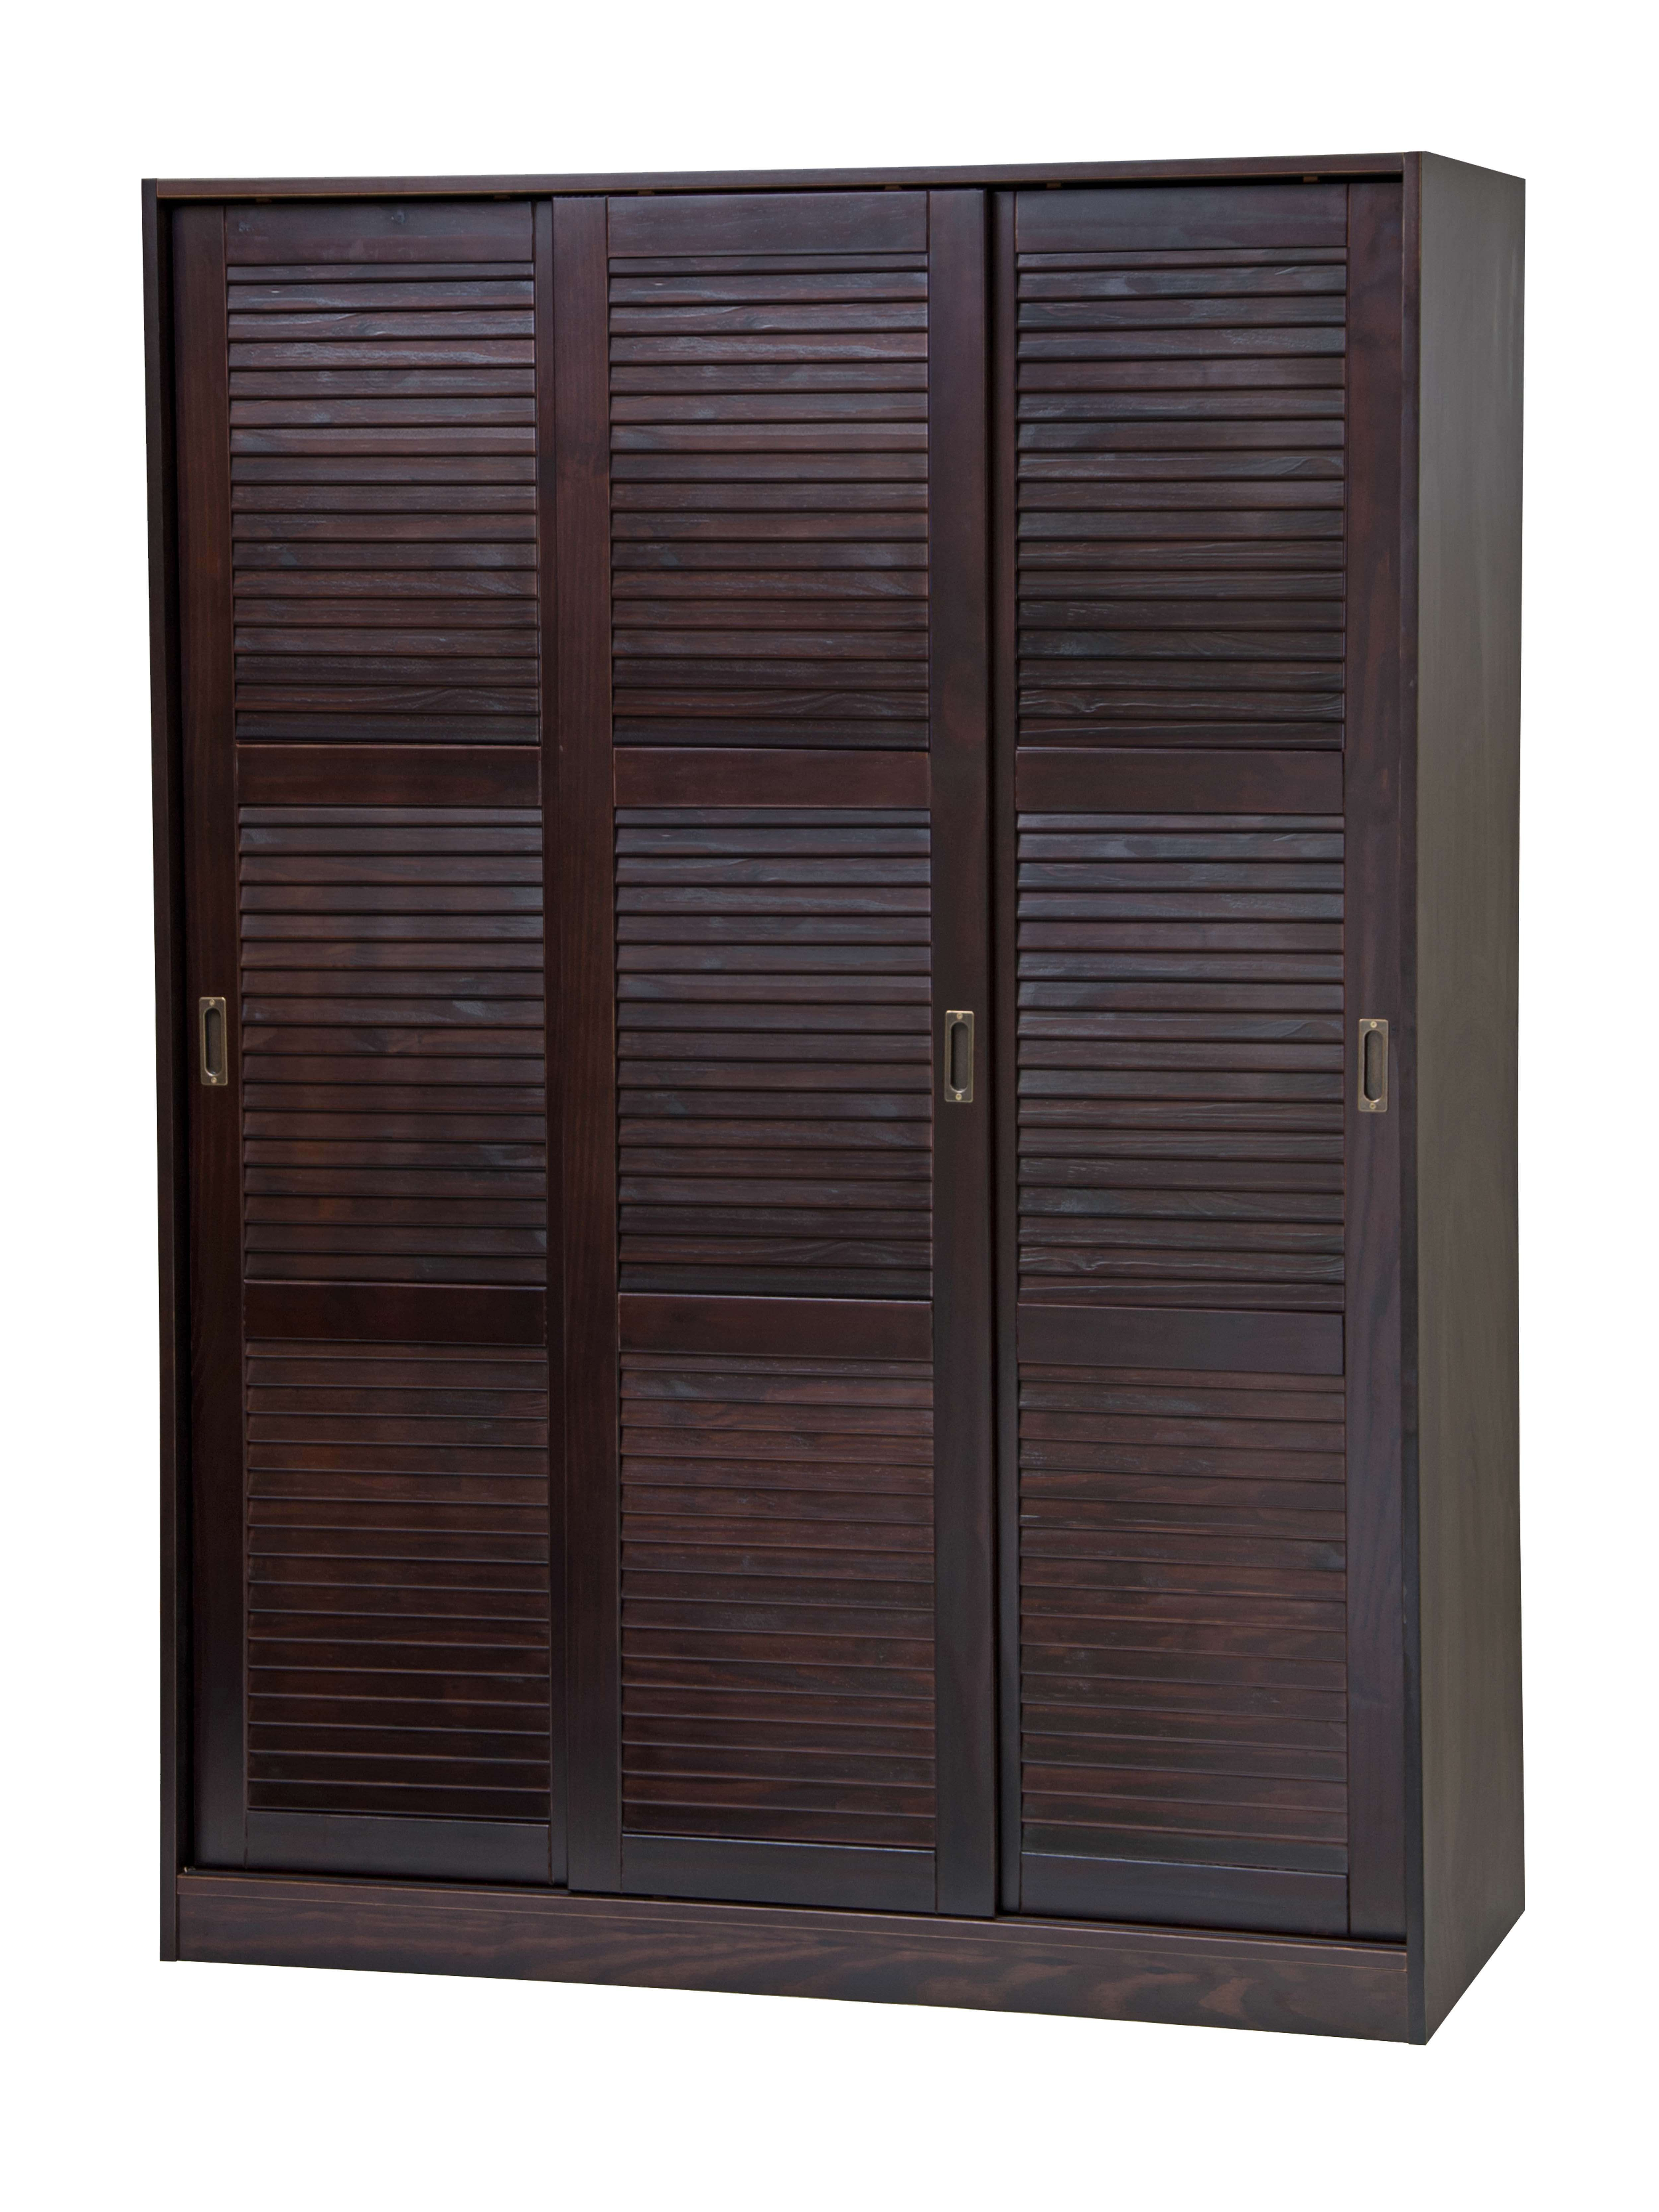 Palace Imports 3 Sliding Door Solid Wood Wardrobe Closet Armoire